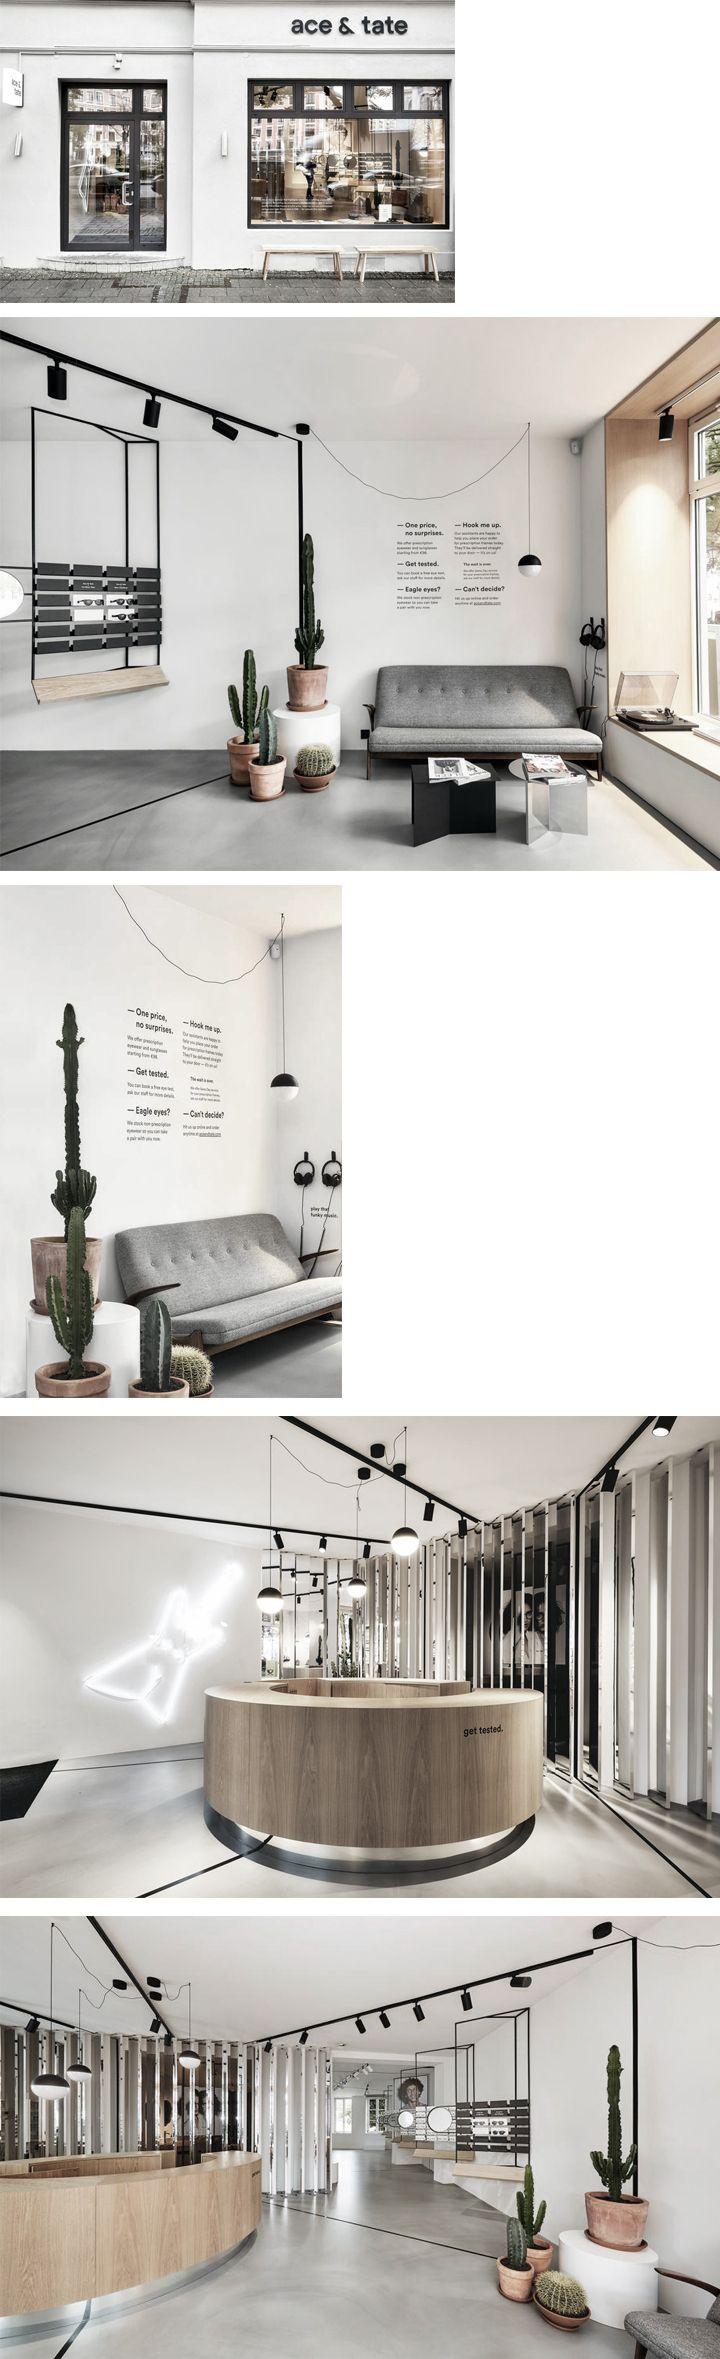 Ace Tate Munich Home Dec Pinterest Munich Hospitality And  # Muebles Gamma San Juan